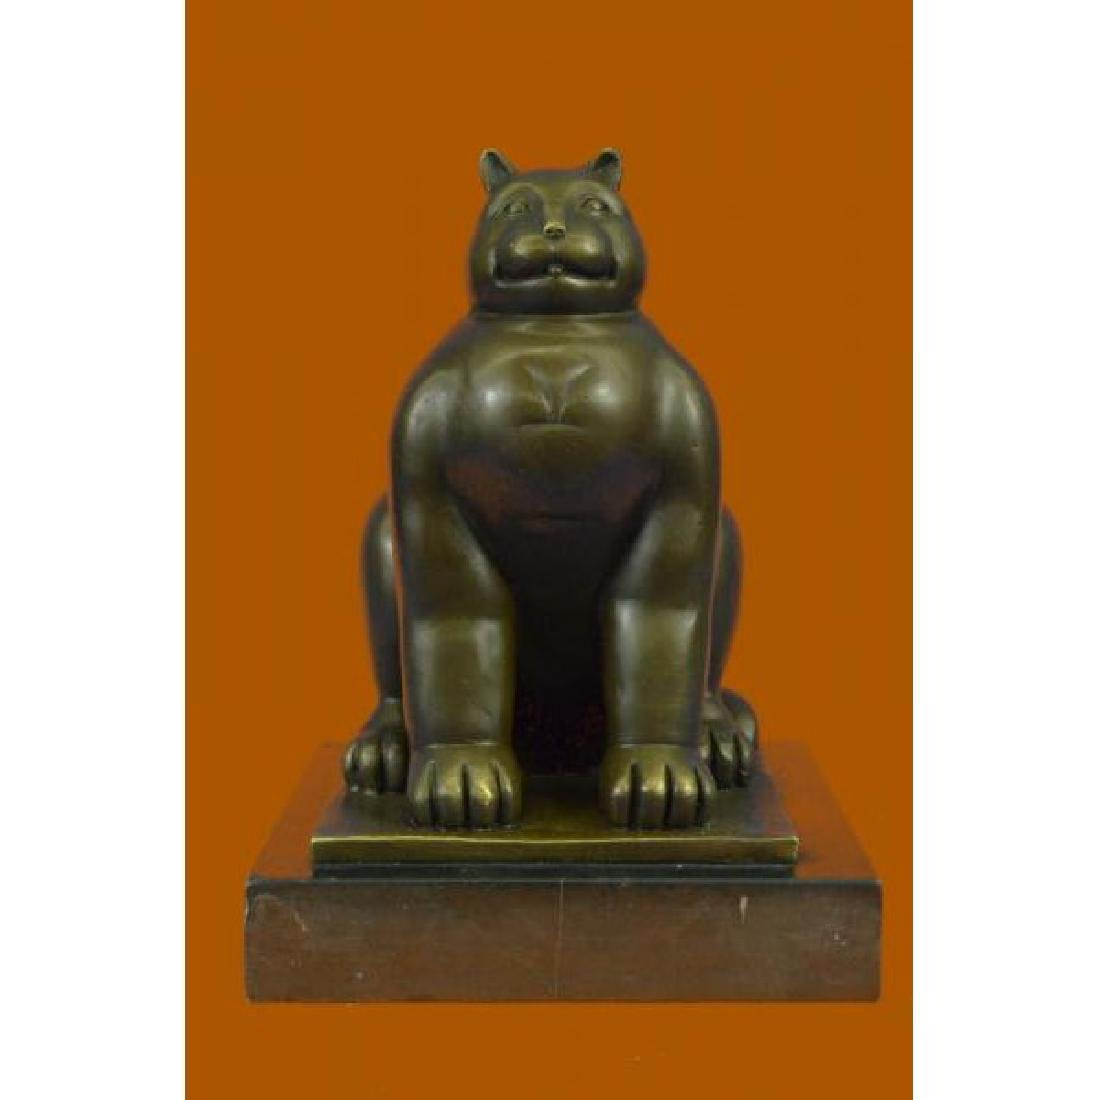 Modern Art Fat Cat by Spanish Artist Botero Bronze